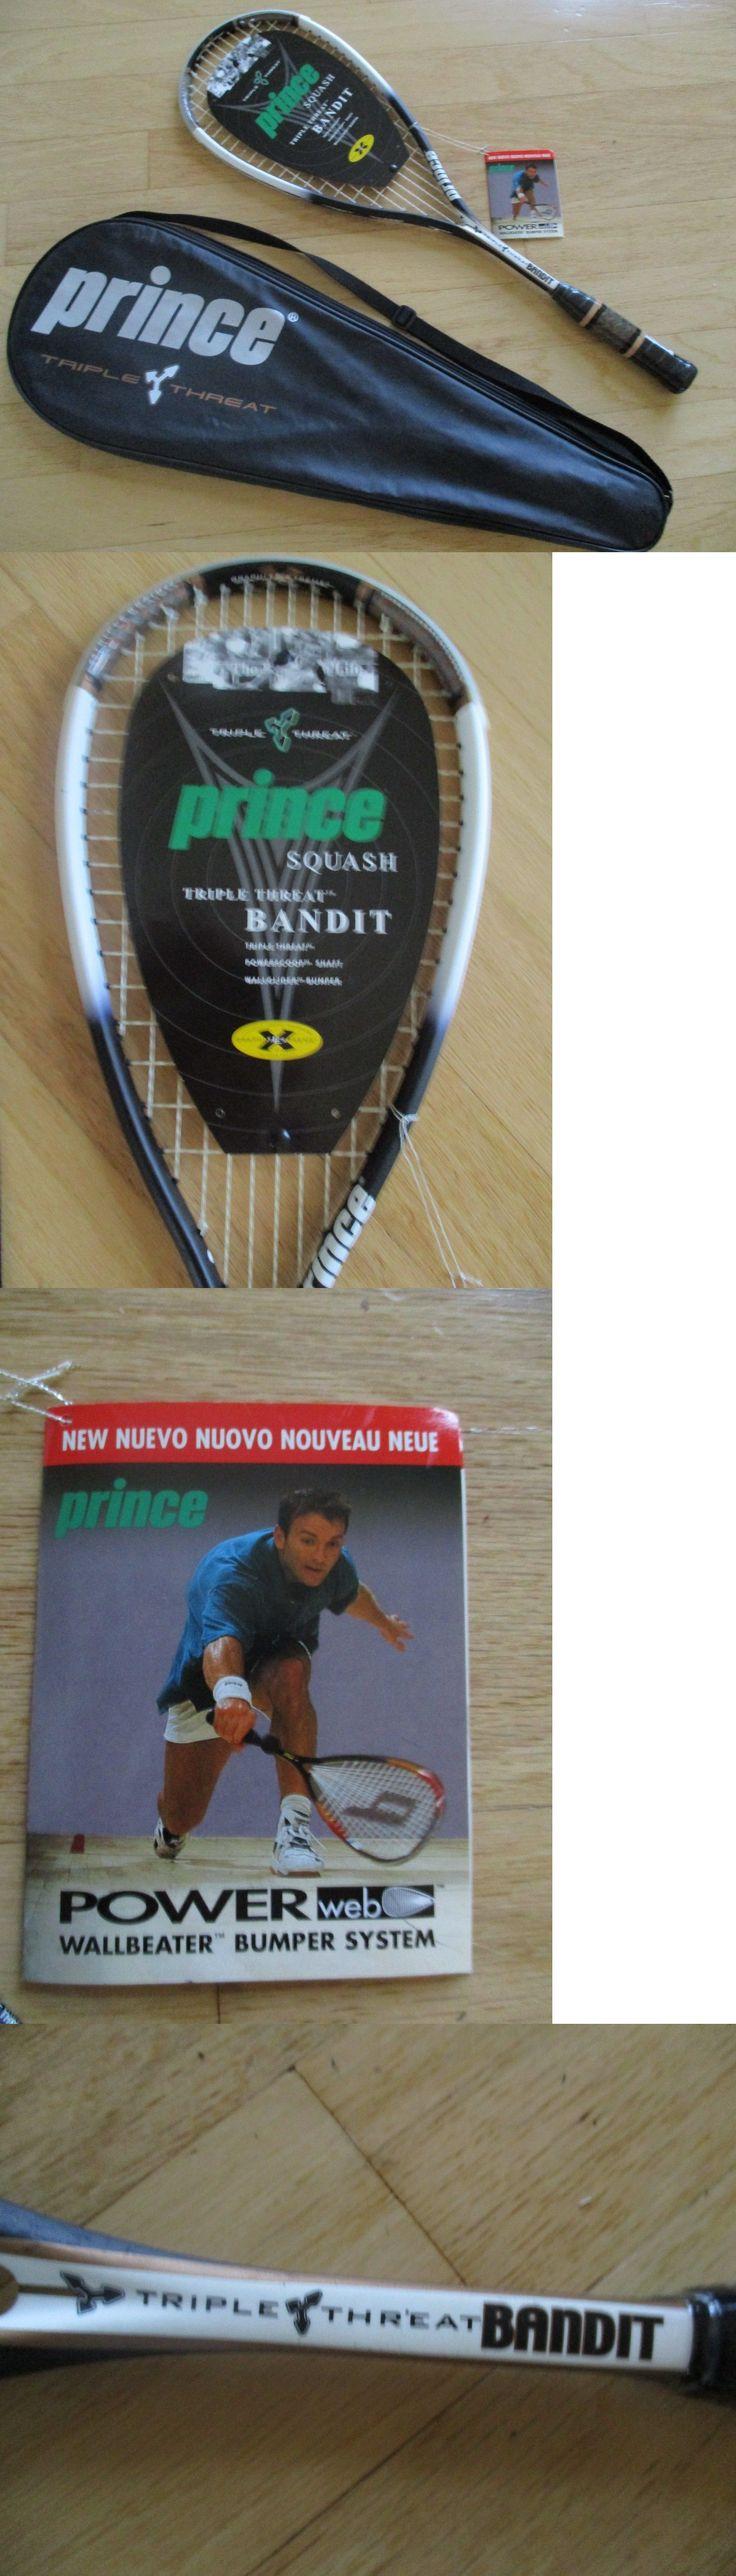 Squash 62166: *Rare* New Prince Triple Threat Bandit Squash Racquet Case Plastic On Handle BUY IT NOW ONLY: $69.0